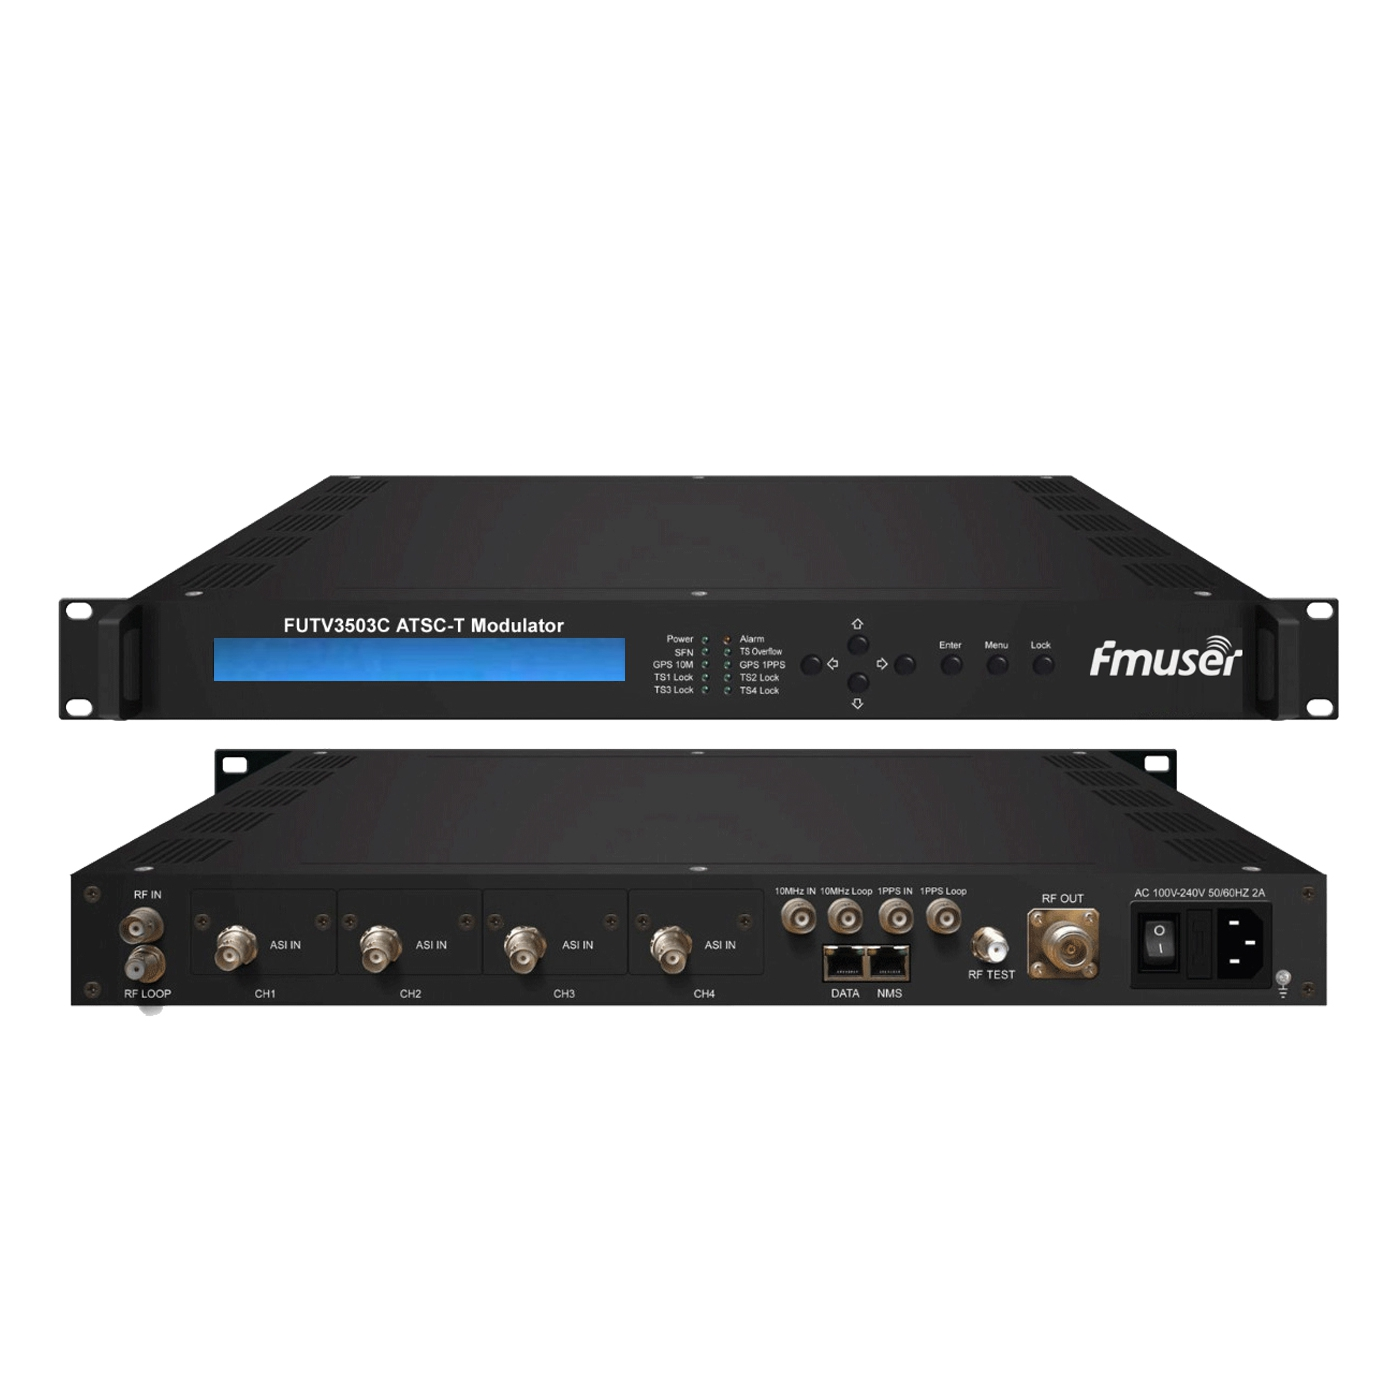 FMUSER FUTV3503C ATSC-T 8VSB Модулятор 8-VSB модуляції РФ (2 * ASI / 2 * SMPTE вхід 310M, RF ontput, ATSC 8VSB модуляція) з управлінням мережі